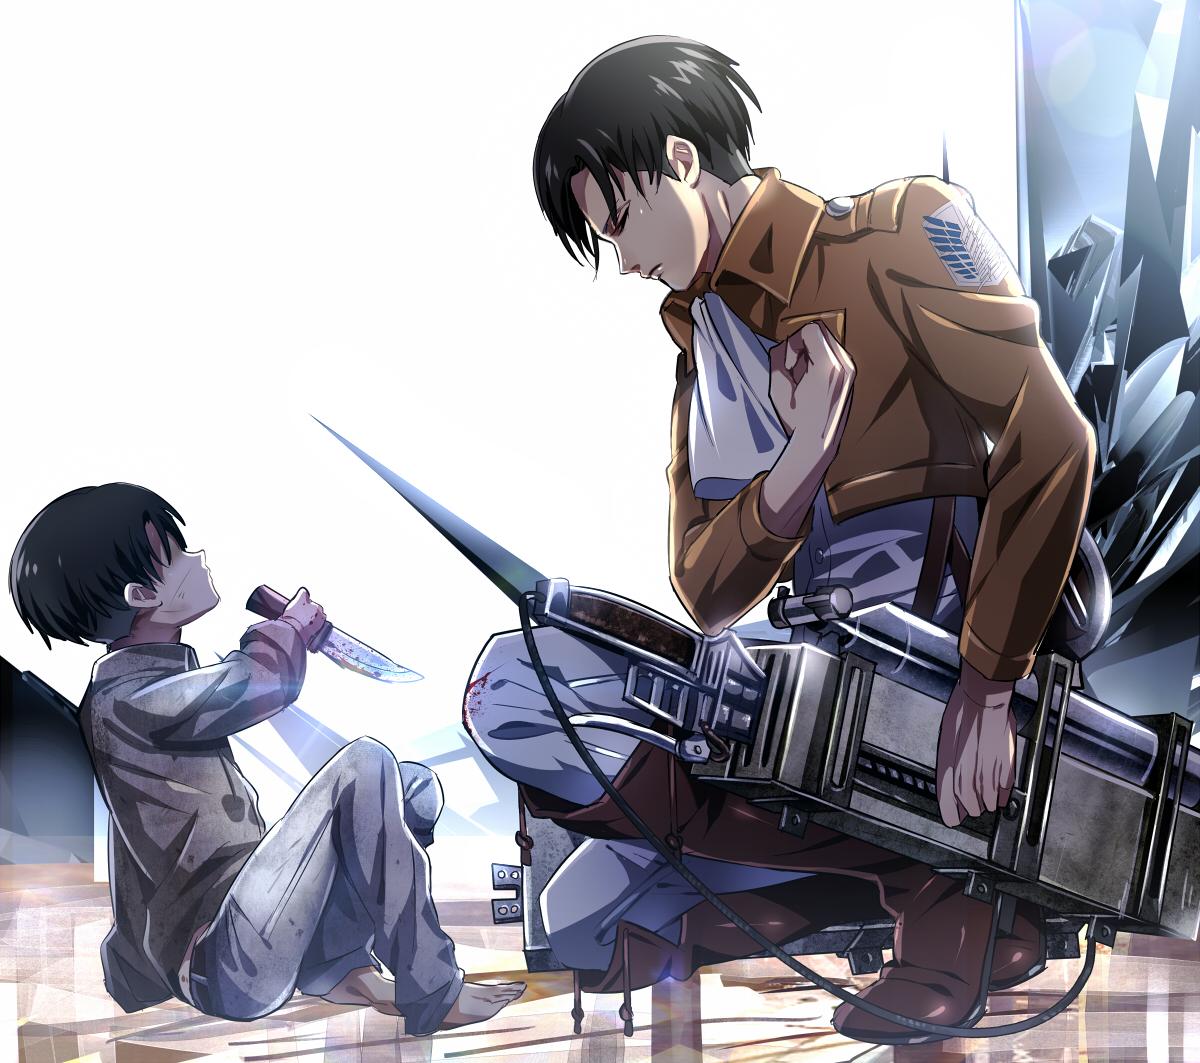 Levi Ackerman Attack On Titan Zerochan Anime Image Board